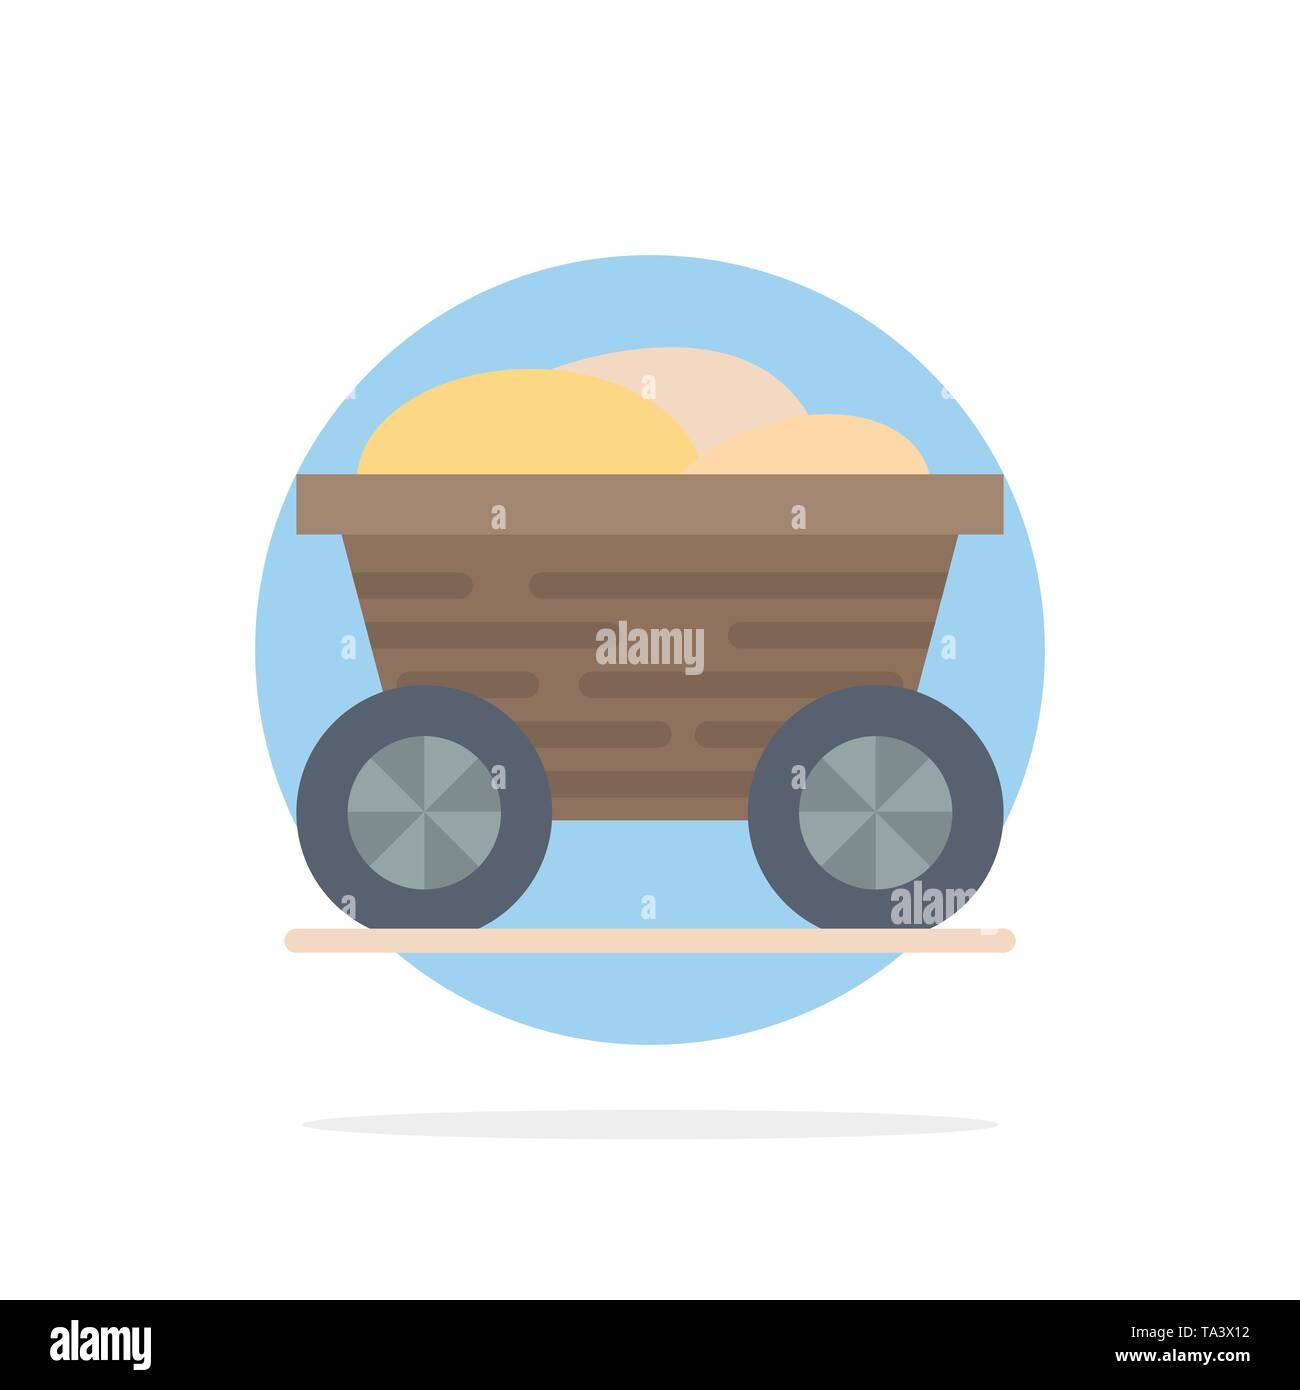 Trolley, Cart, Food, Bangladesh Abstract Circle Background Flat color Icon - Stock Image